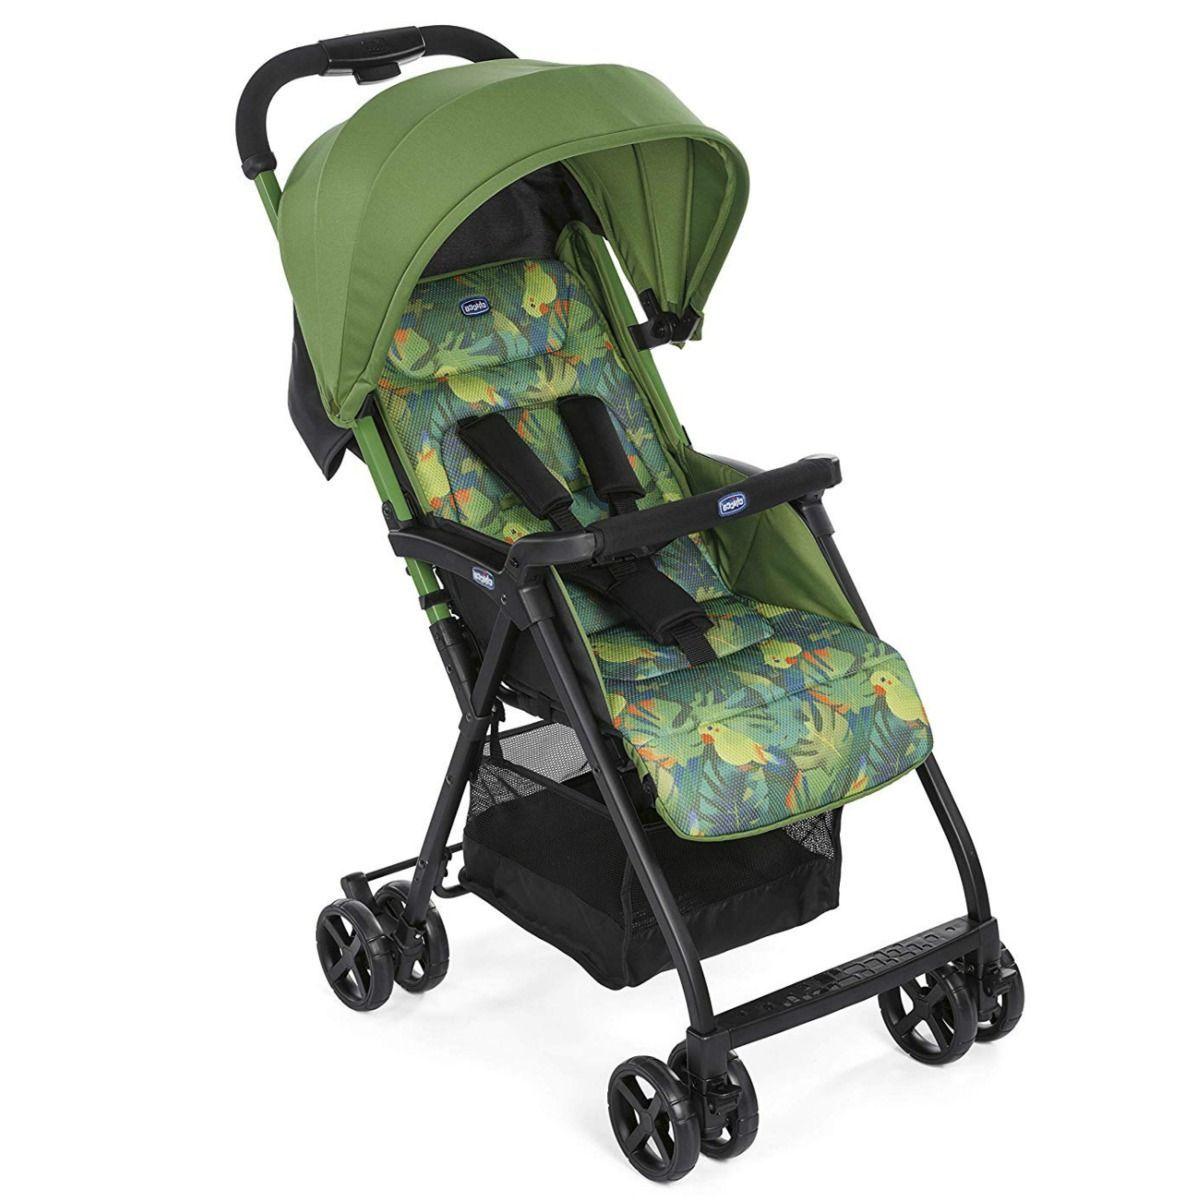 Chicco Tropical Jungle Green Ohlala Stroller Stroller